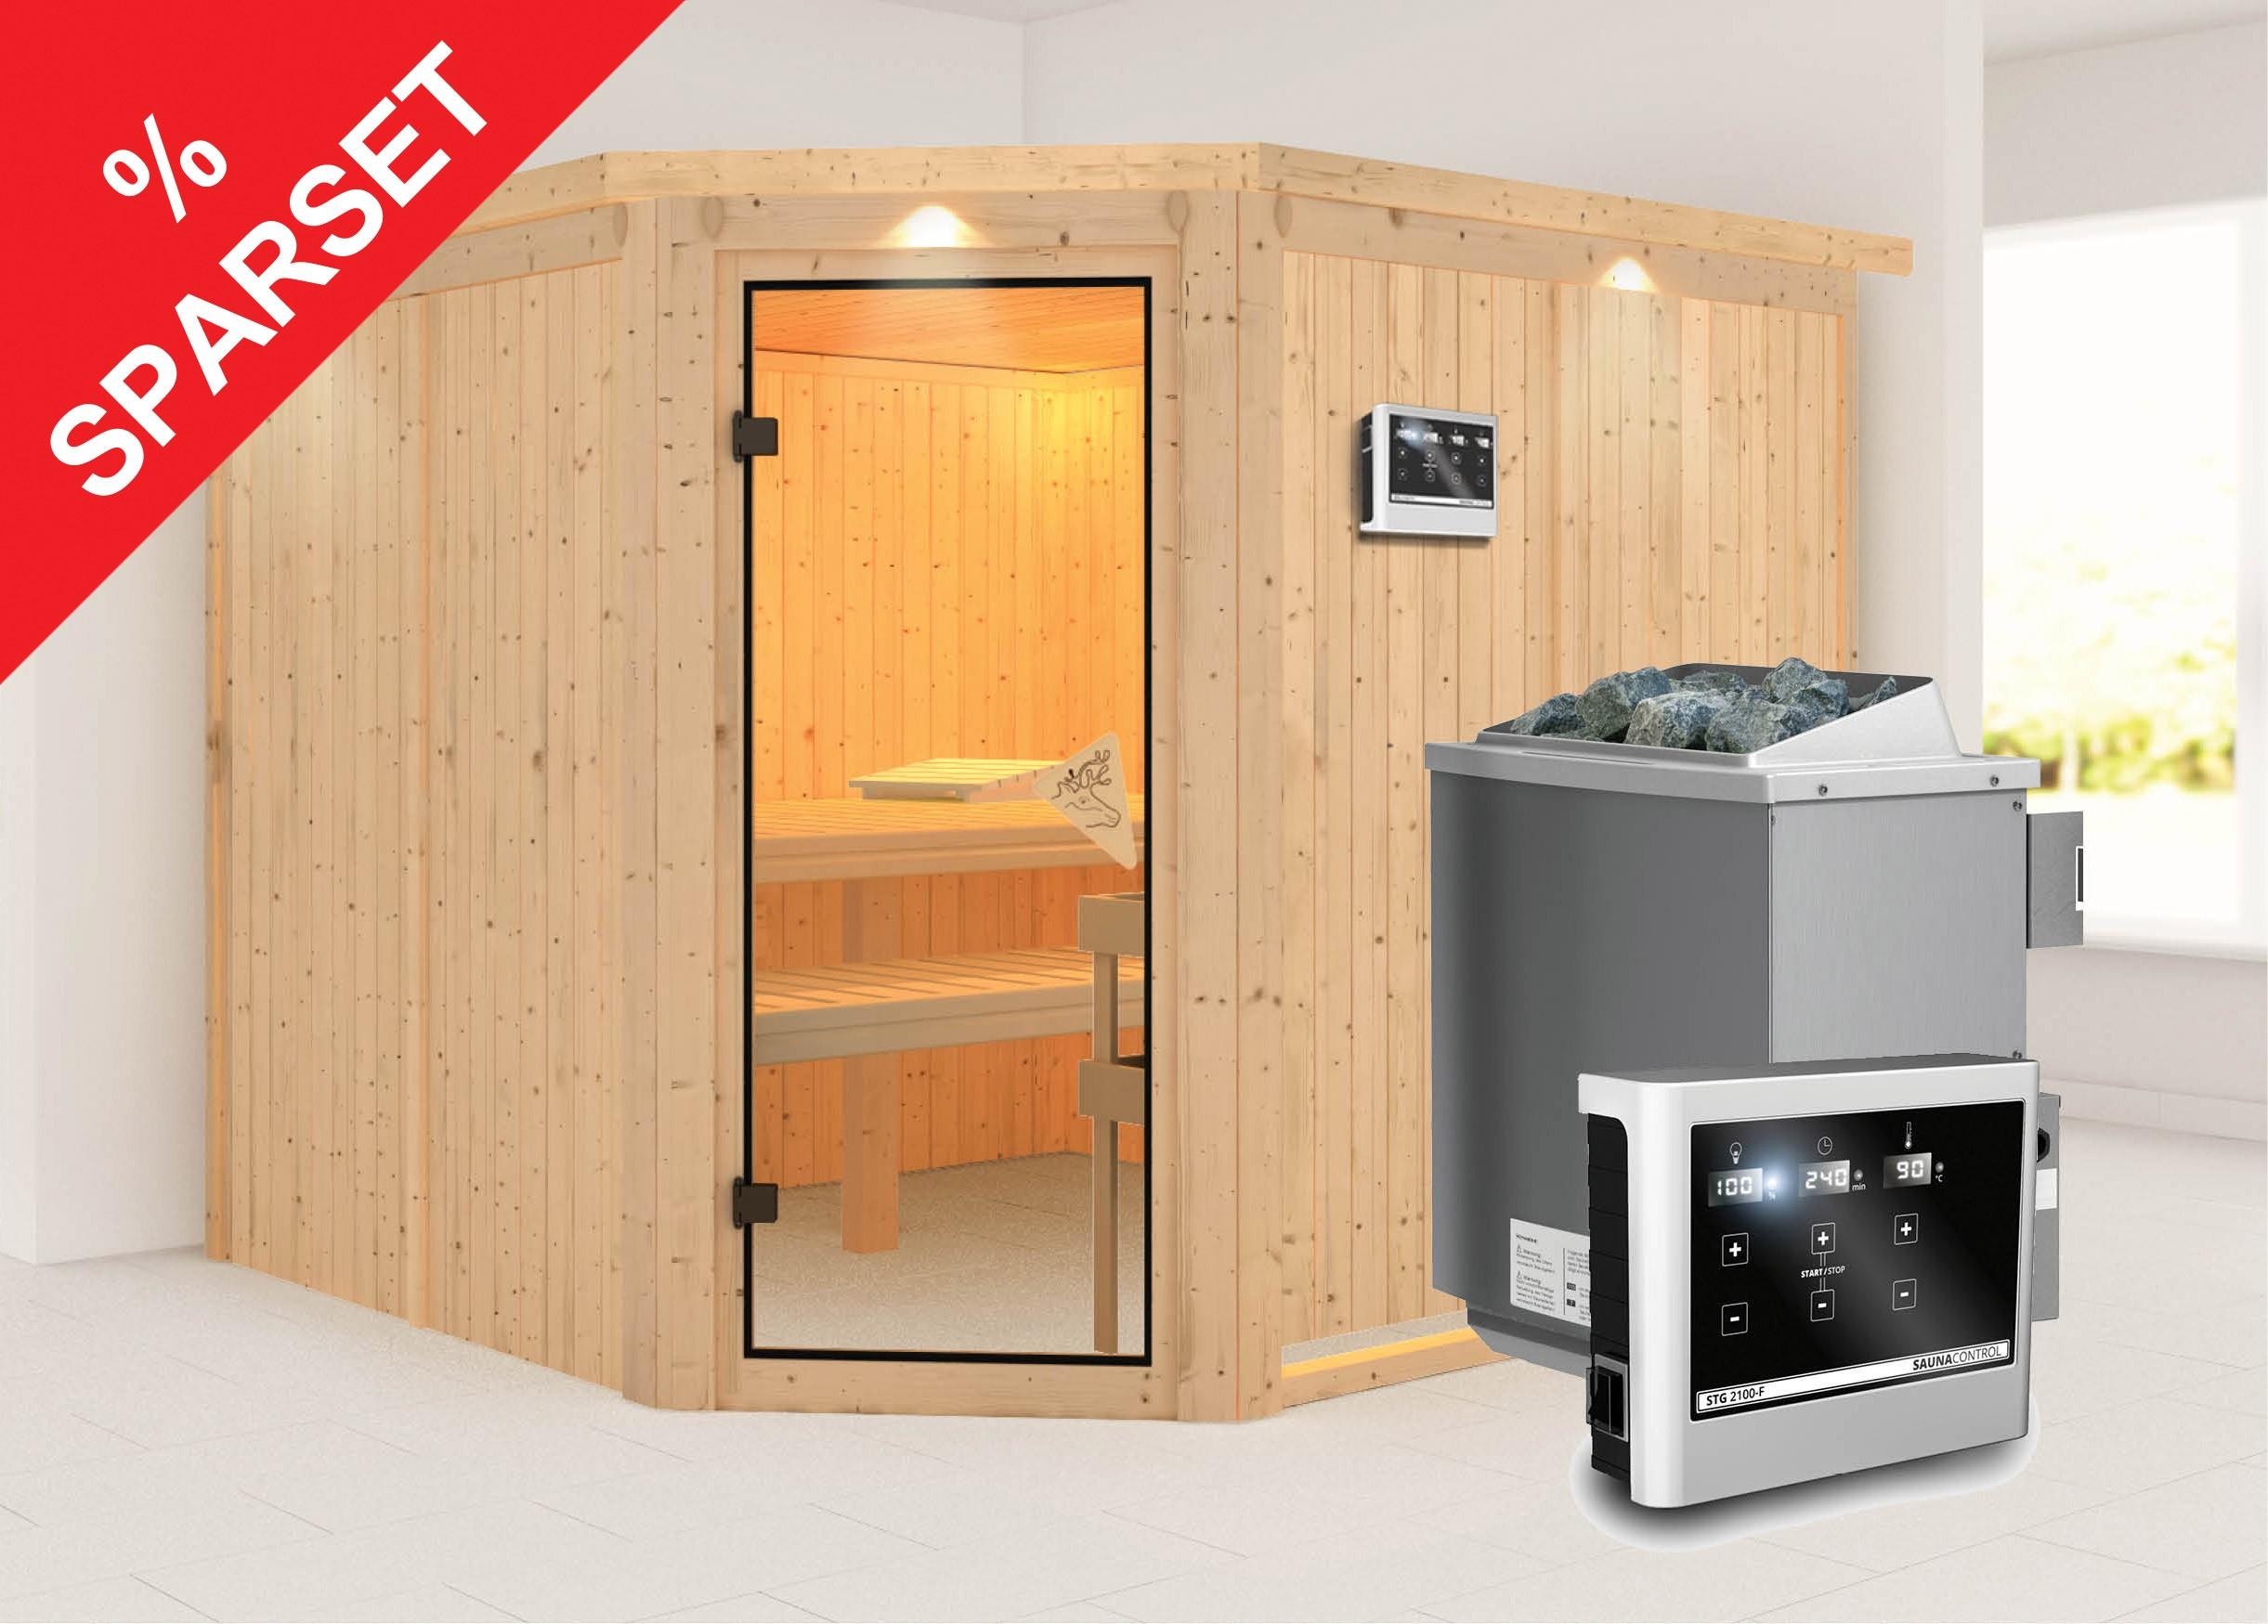 karibu sauna farin 68mm dachkranz bio ofen 9 kw extern. Black Bedroom Furniture Sets. Home Design Ideas